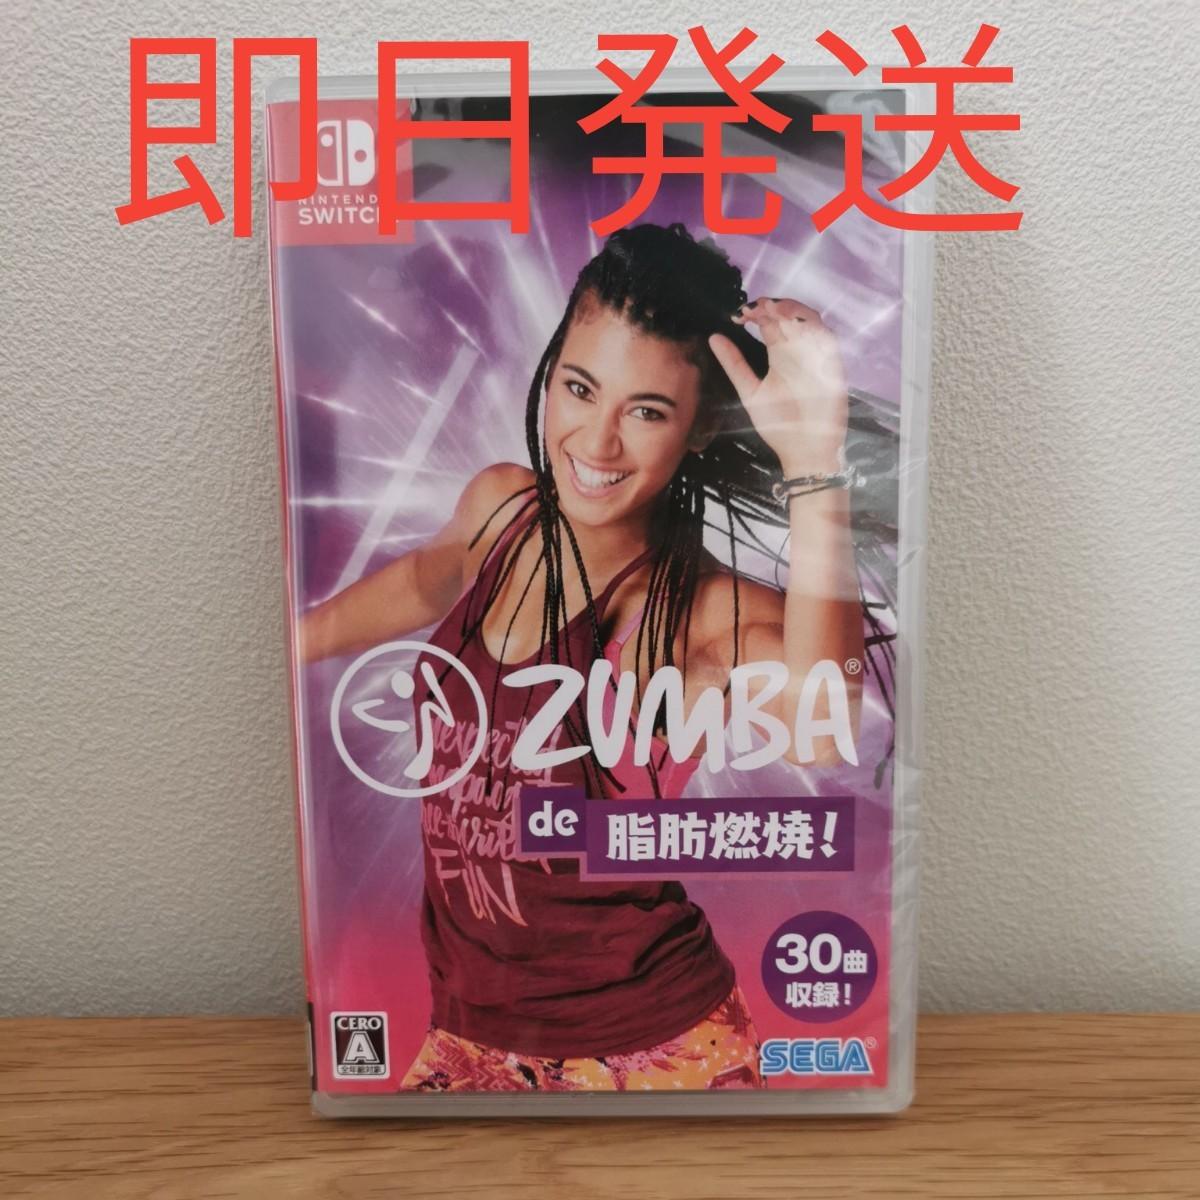 switchソフト「ZUMBA DE 脂肪燃焼 !」